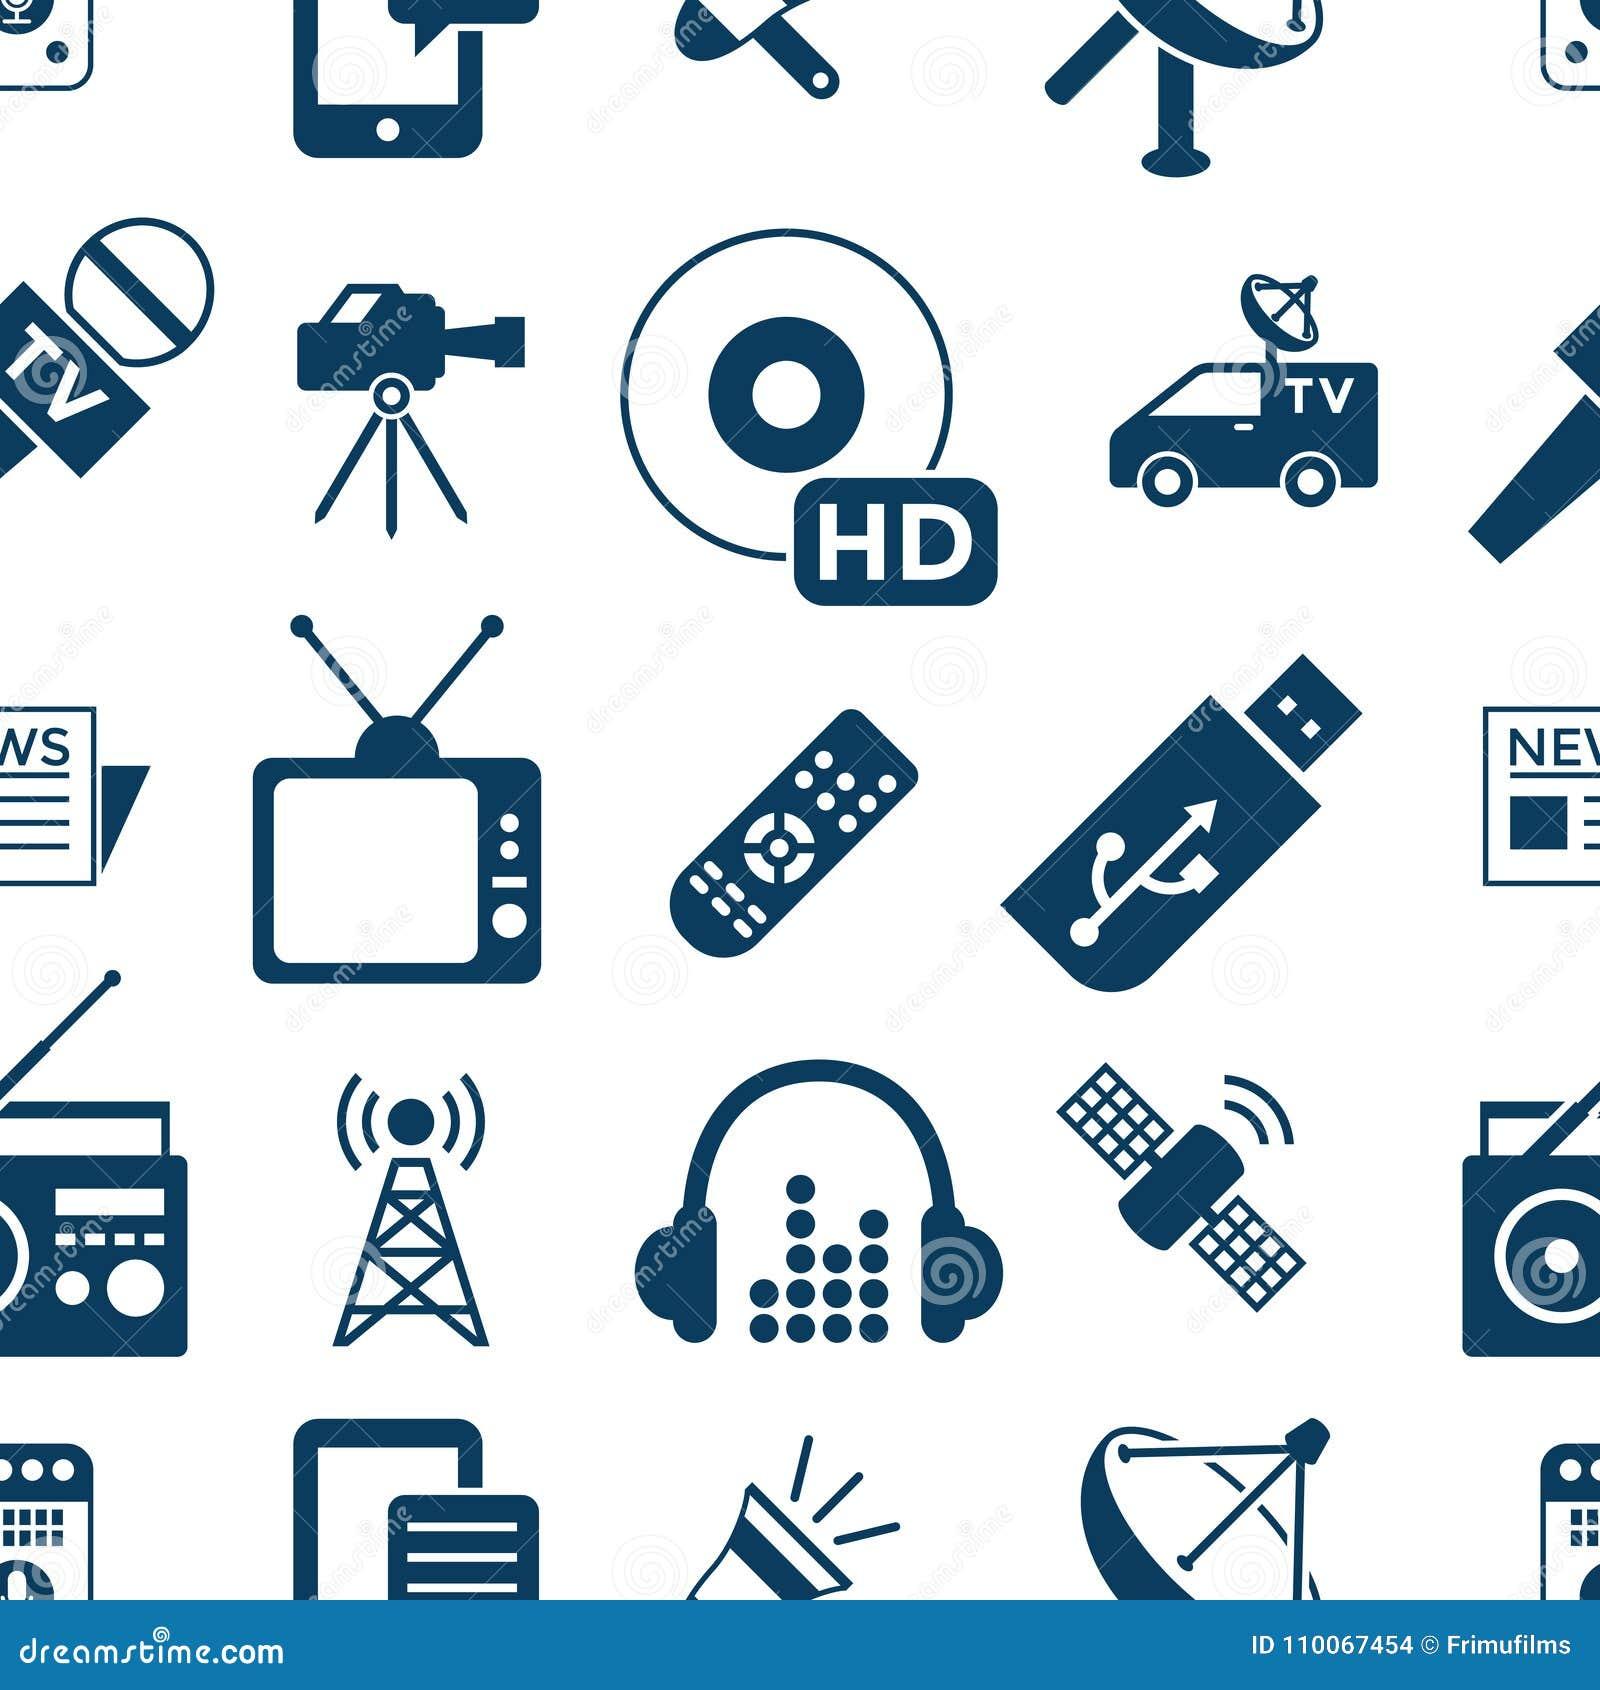 Digital Mass Media Objects Color Simple Flat Stock Illustration